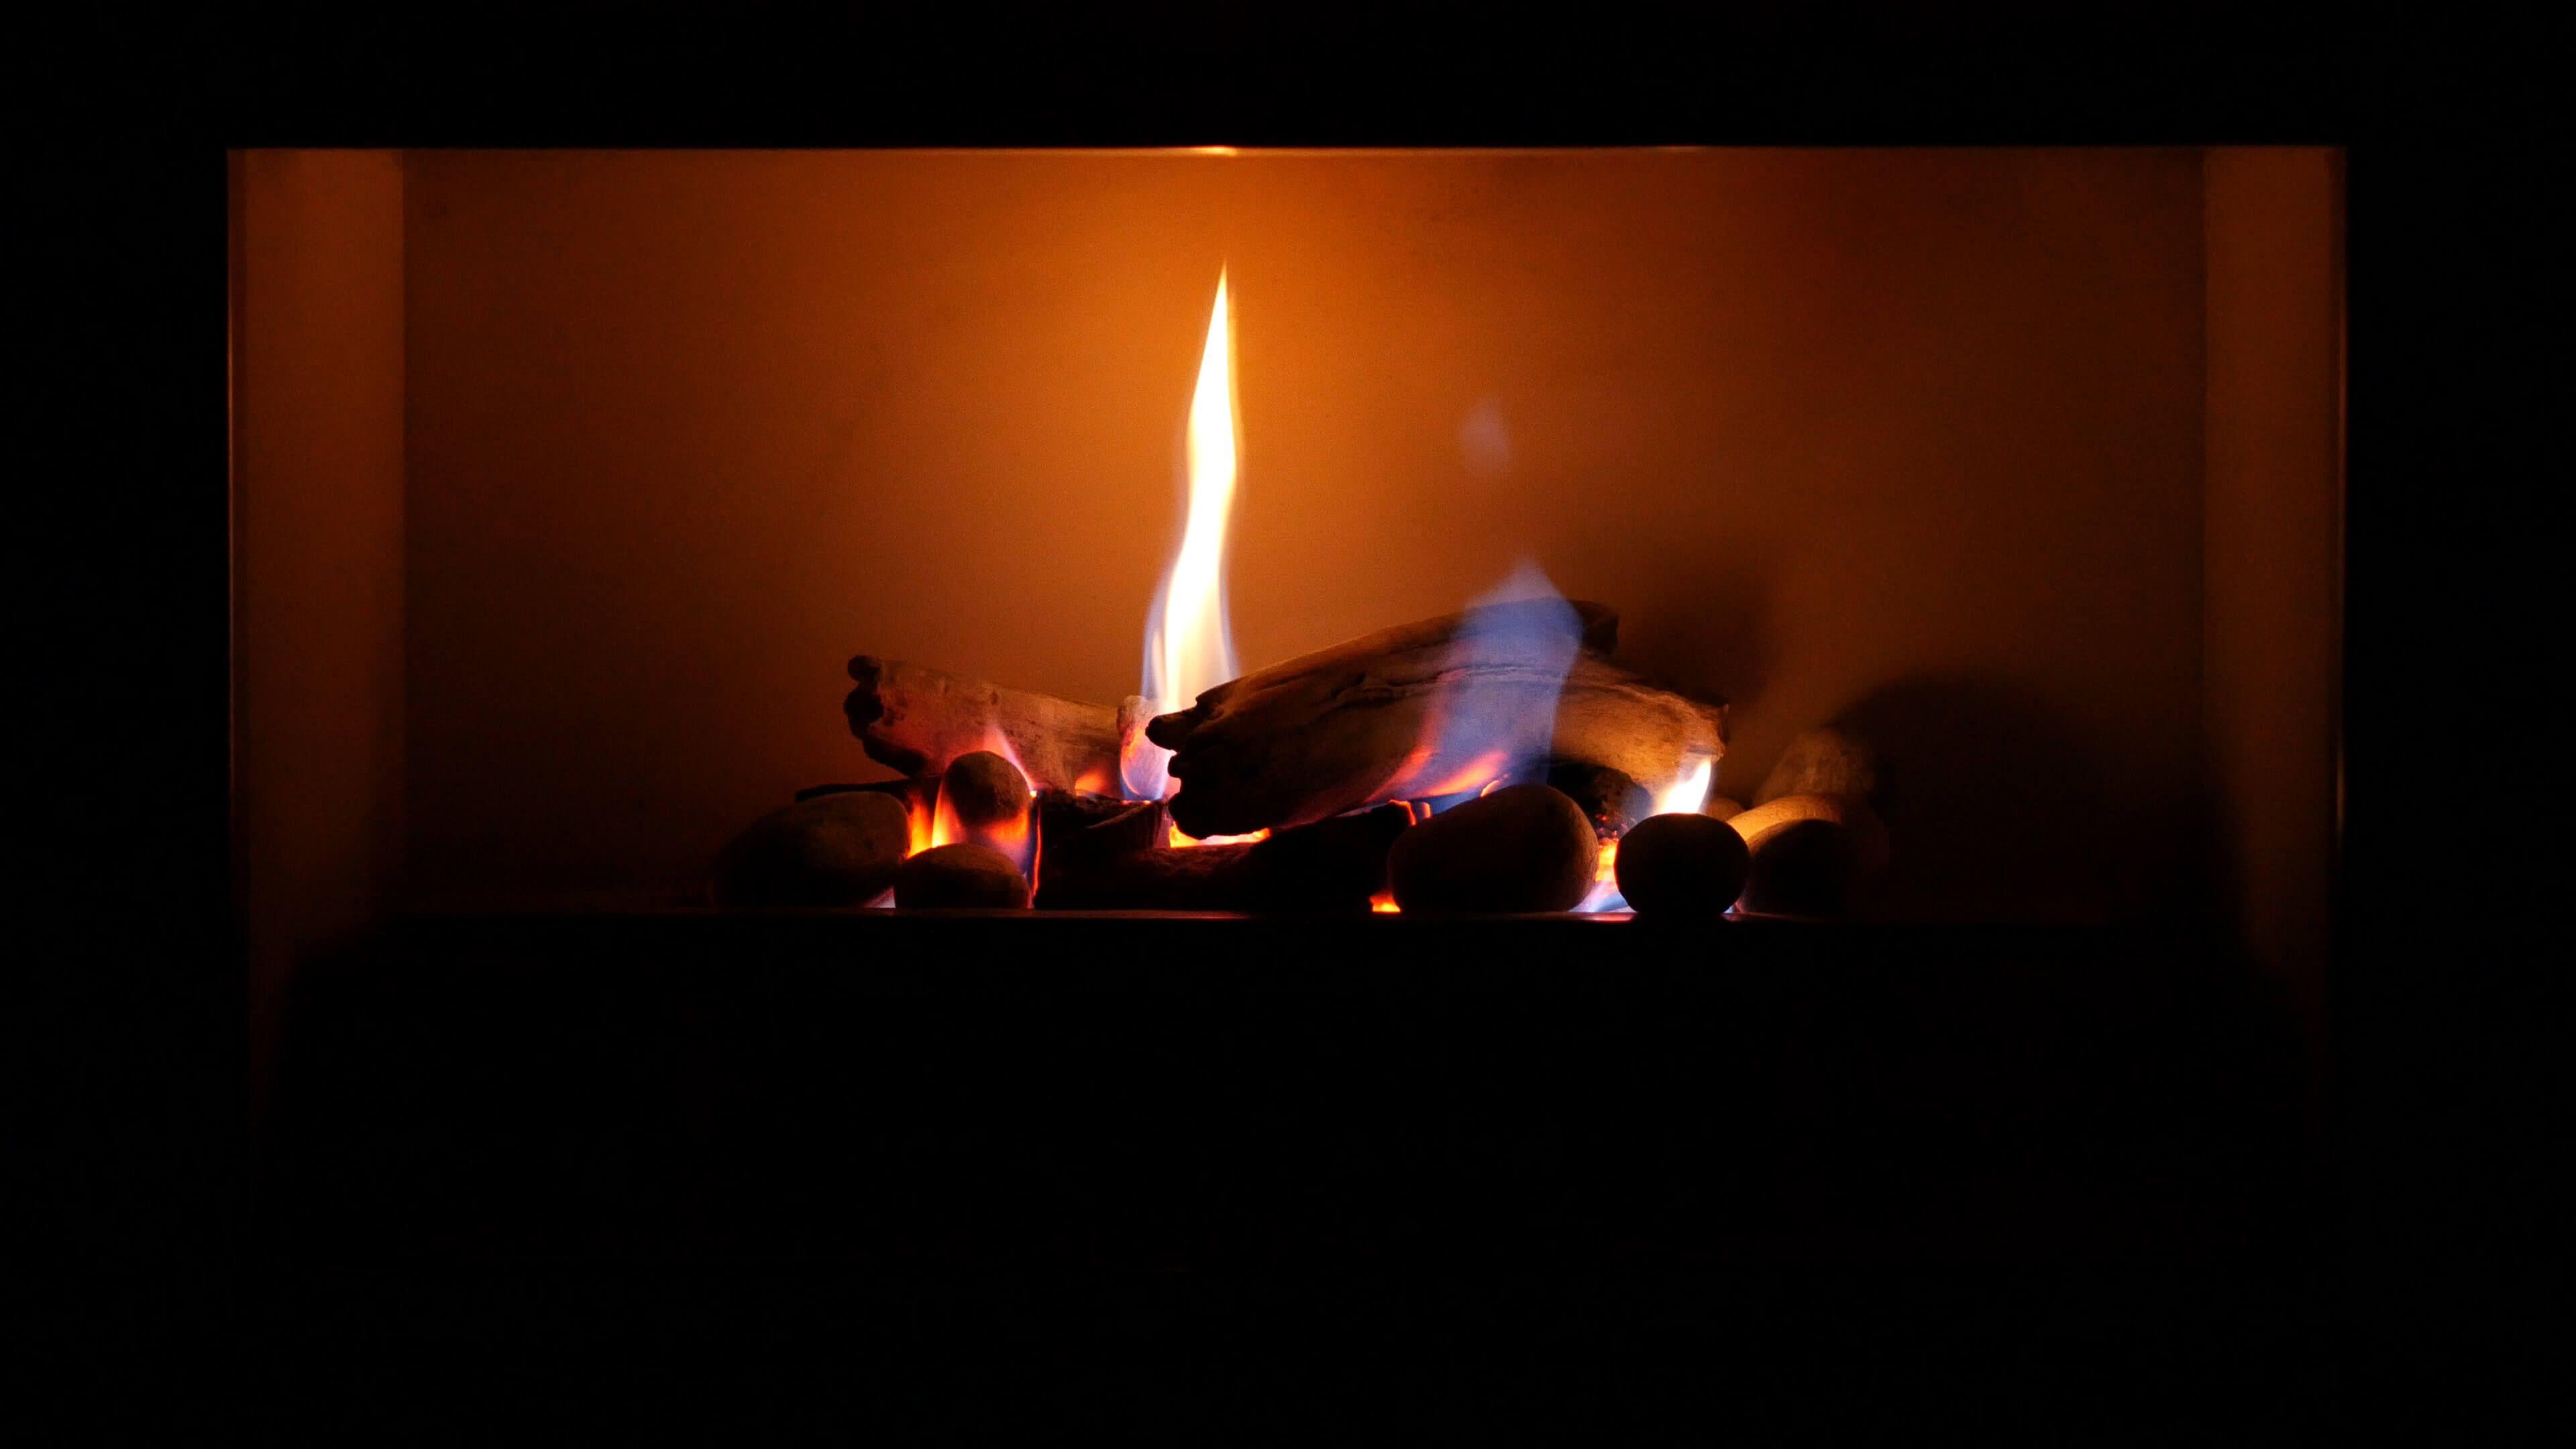 virtual fireplace fireplace screensavers virtual fireplace cozy rh pinterest com